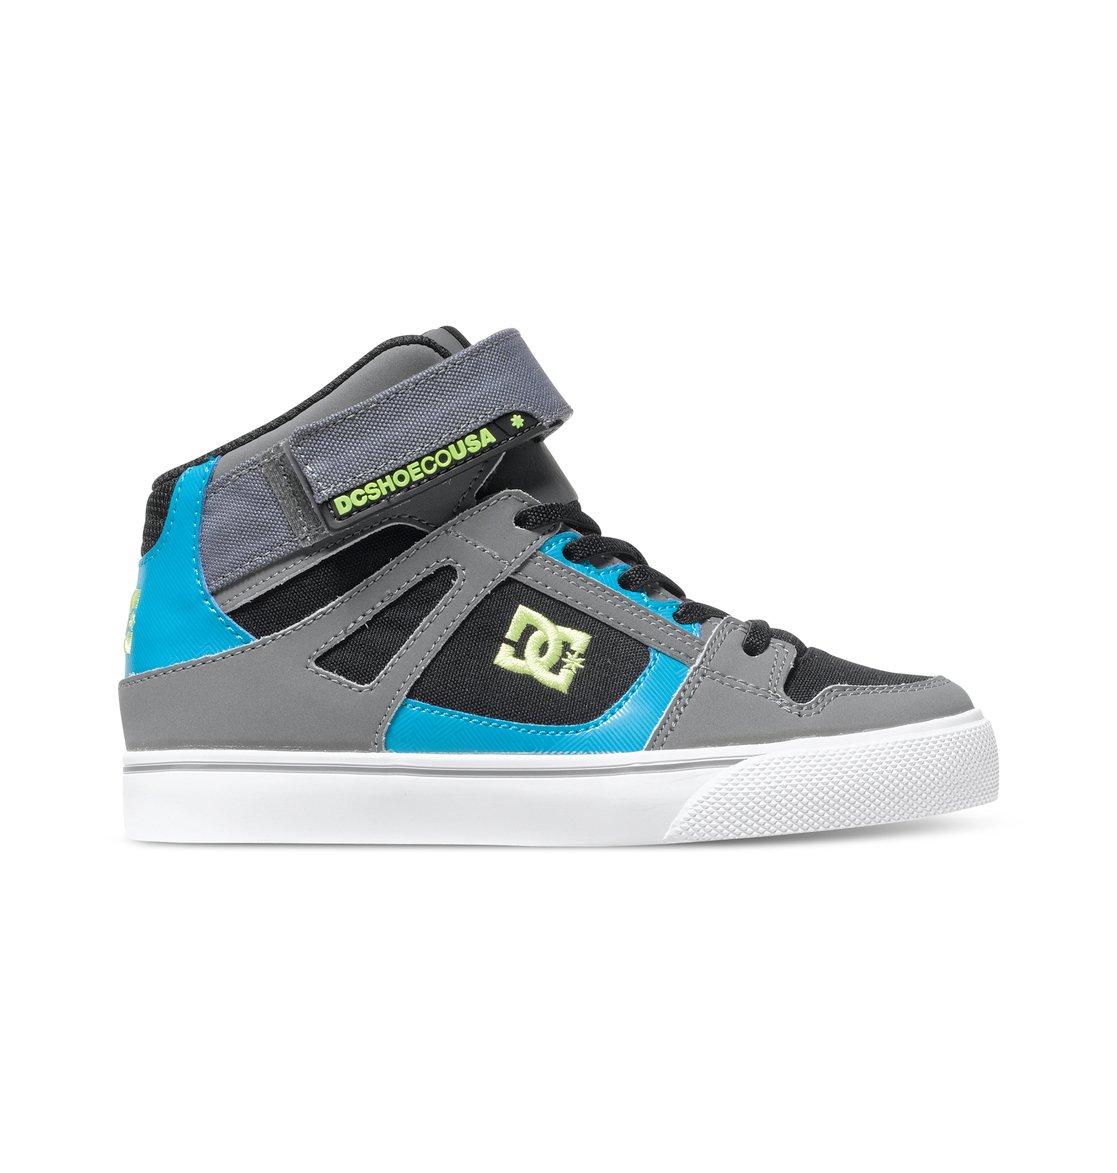 Spartan EV - Dcshoes������� ���� Spartan EV ��� ������� �� DC Shoes.<br>��������������: ������ �� �������� Velcro � ���������� ������, ������� ��� � �������������� ���������, ������� ���� � ������� � ������ ������������, ���� � ��������� �����������, ��������� ��� �������� � ���������� �� �����������, ����������������� �����������, ������������� ���������� �������, ��������� ������� ���������� ������� DC Pill Pattern. <br>������: ����: ���� / ���������: �������� / �������: ������.<br>